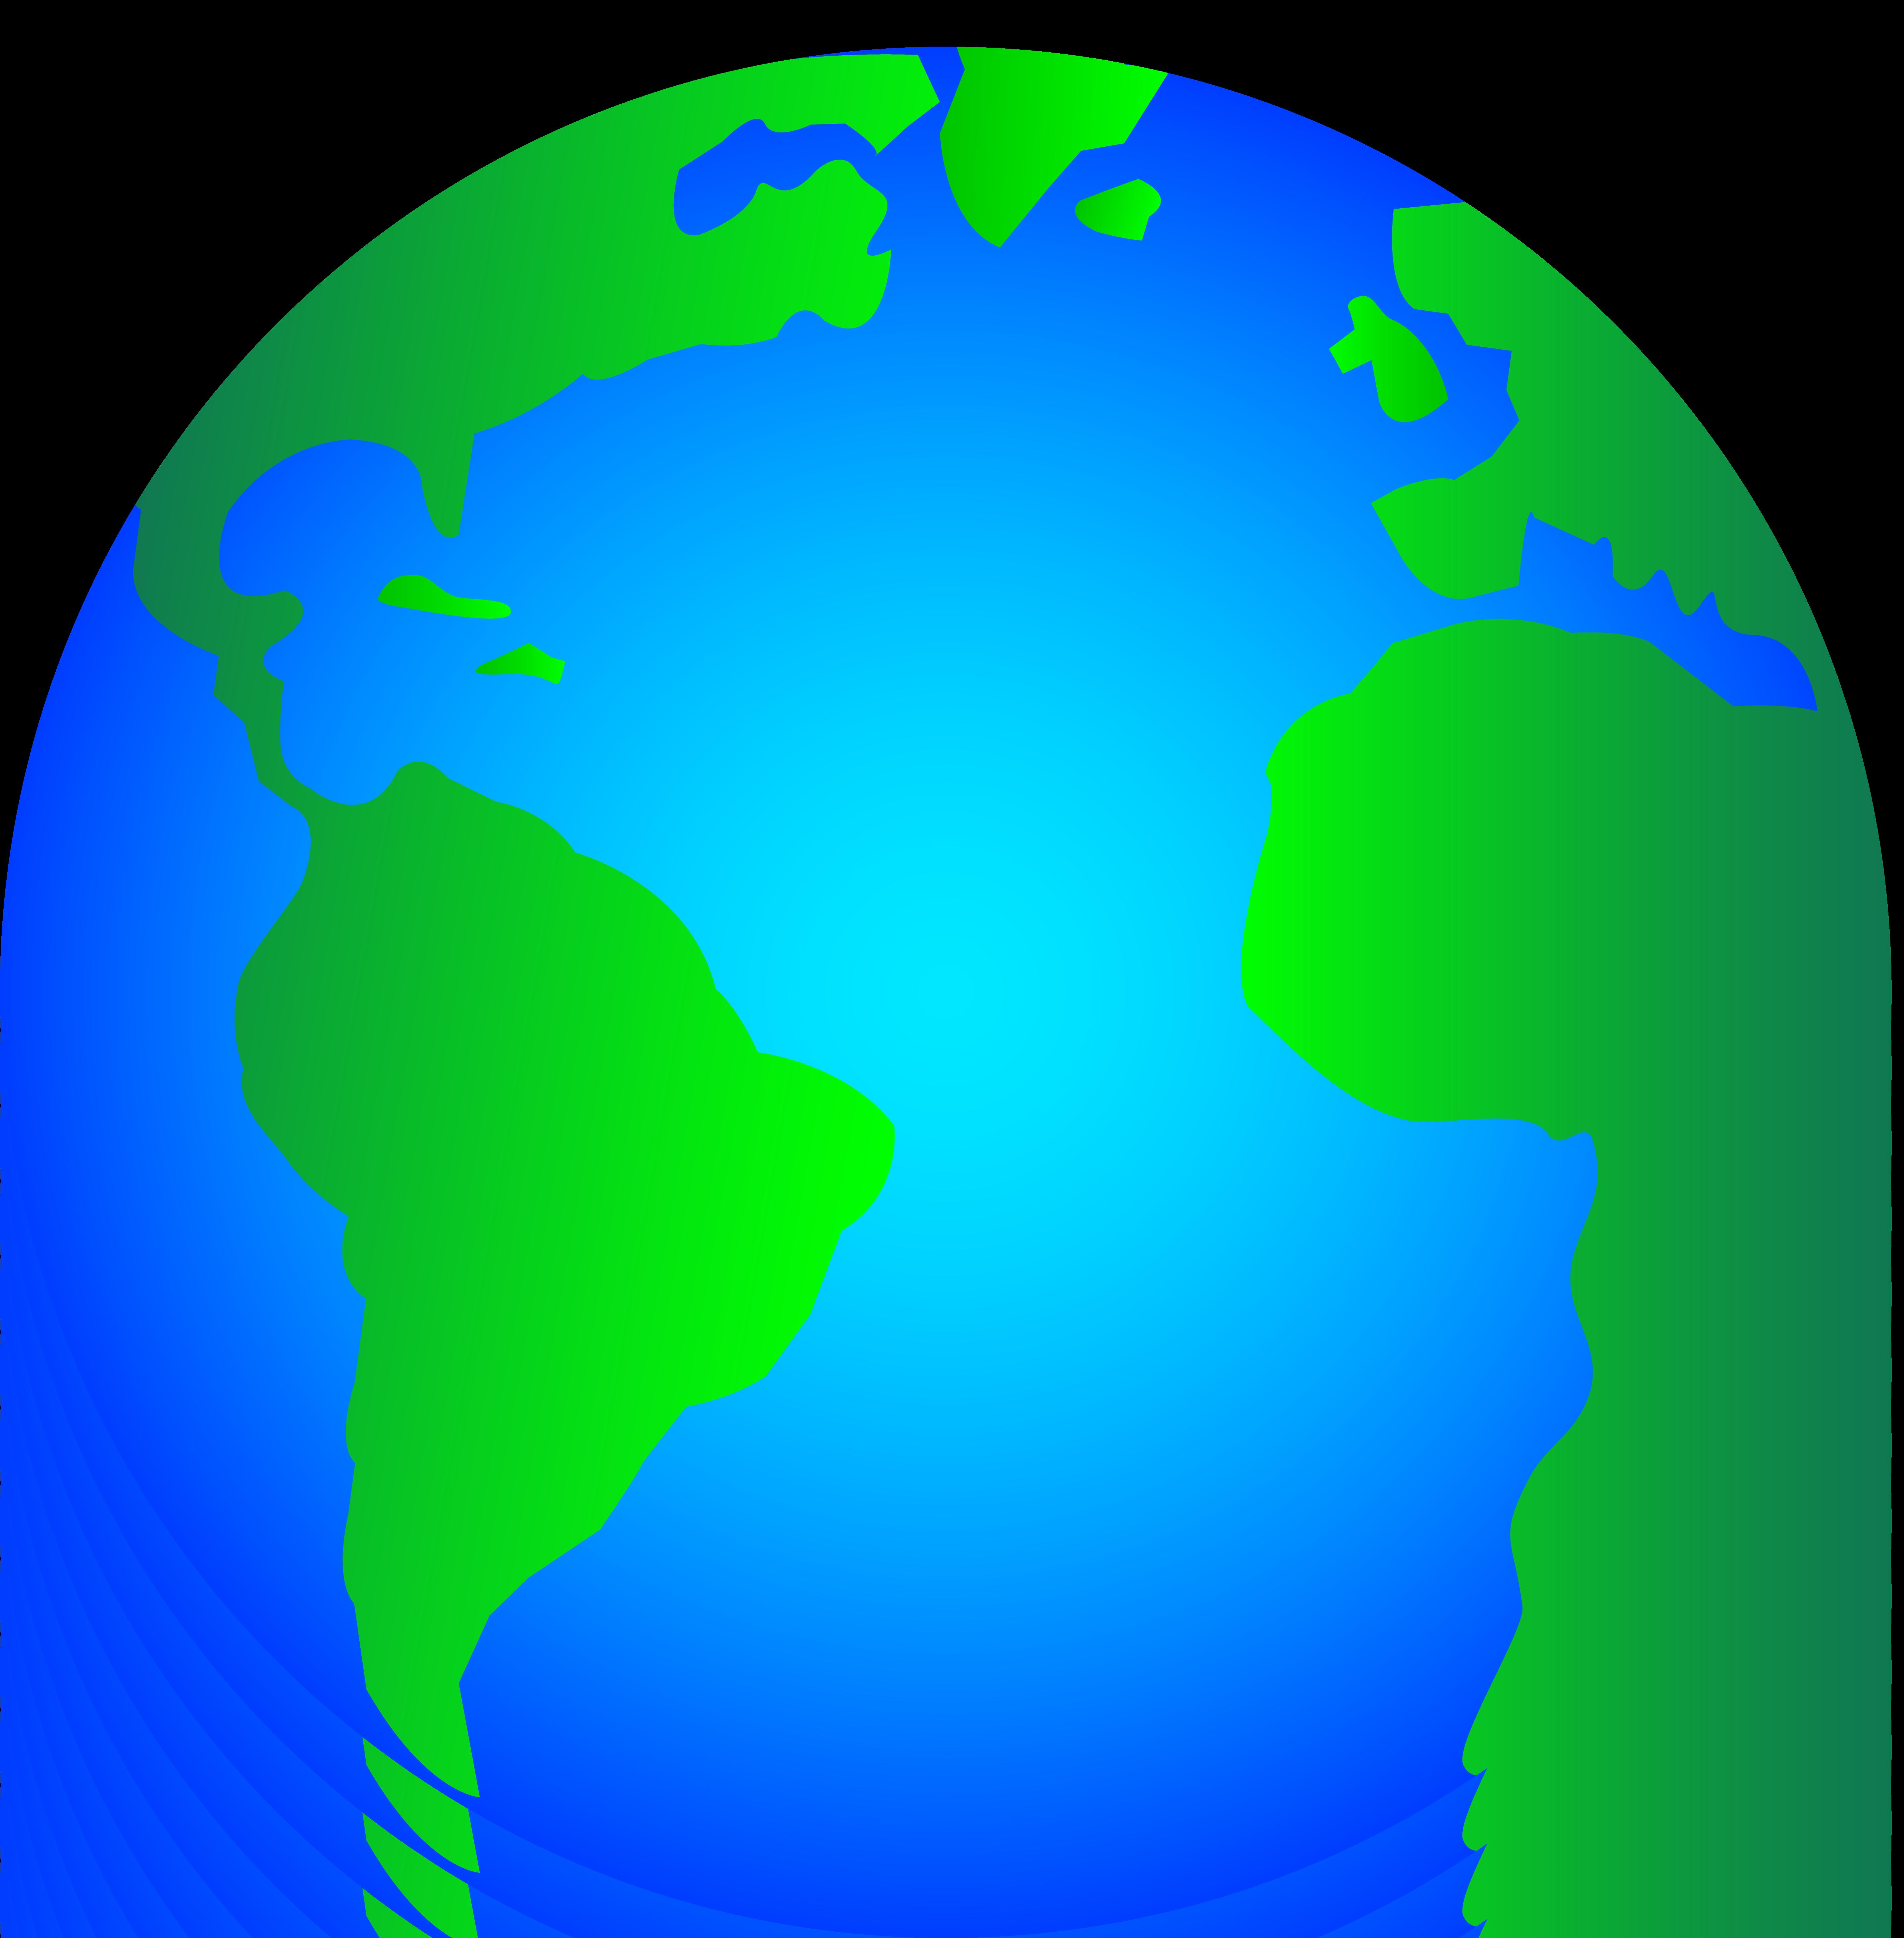 Clip Art Of World-Clip Art Of World-3